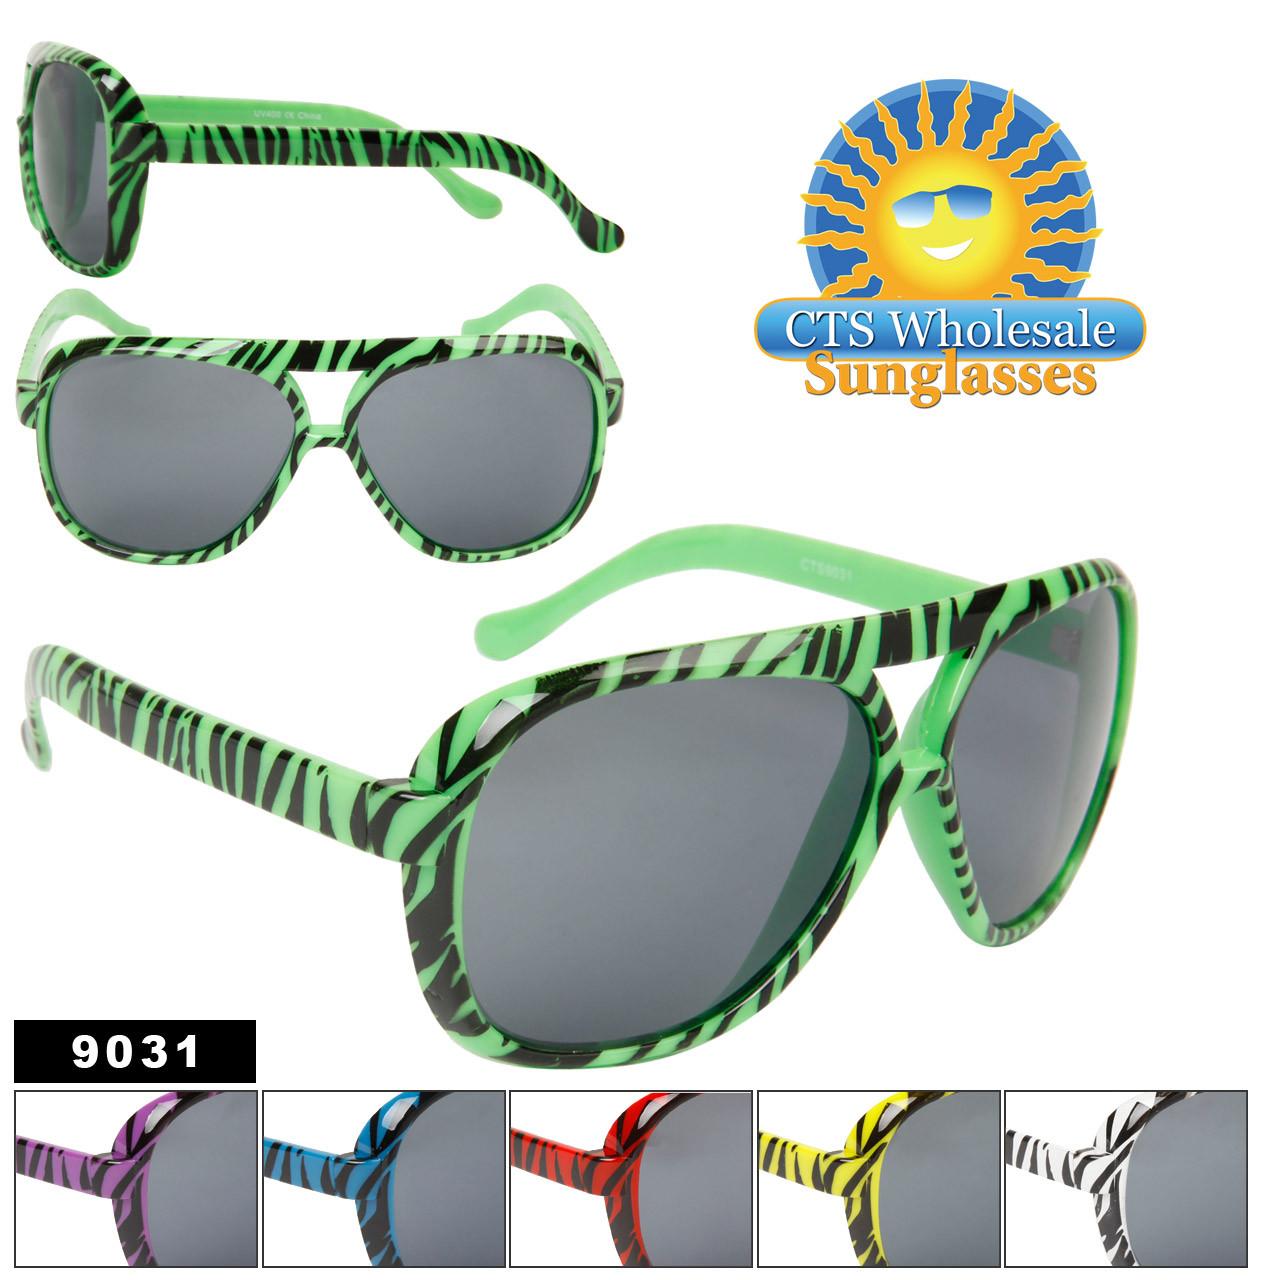 Sunglasses Aviators 9031Zebra Plastic PrintCts Wholesale nOP80wkX